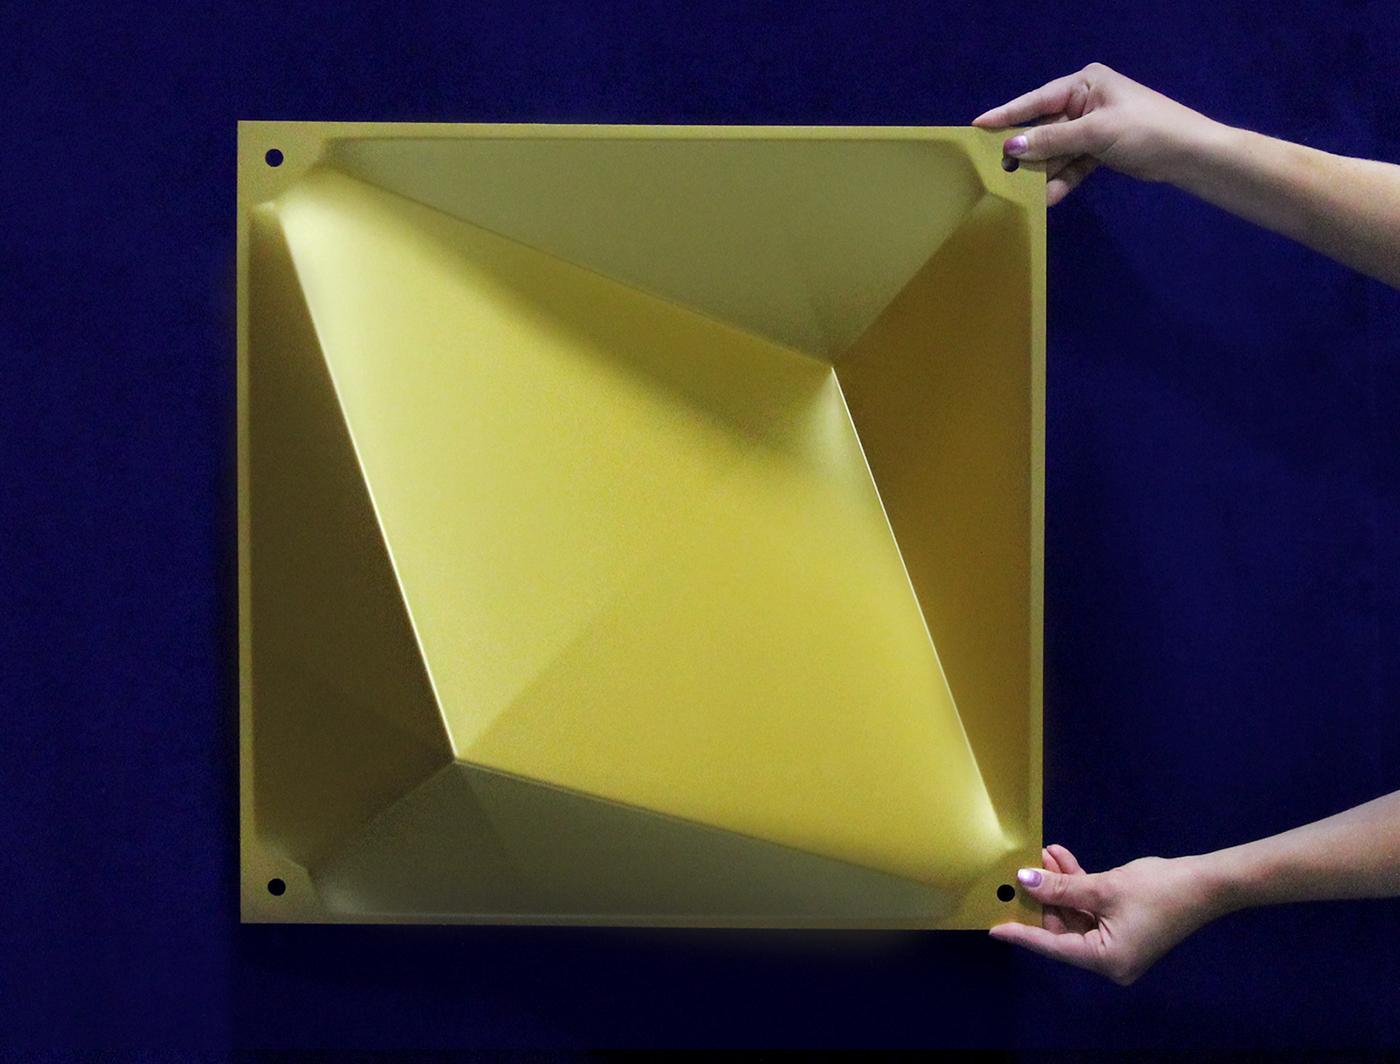 Gold Zeddit panel in natural light